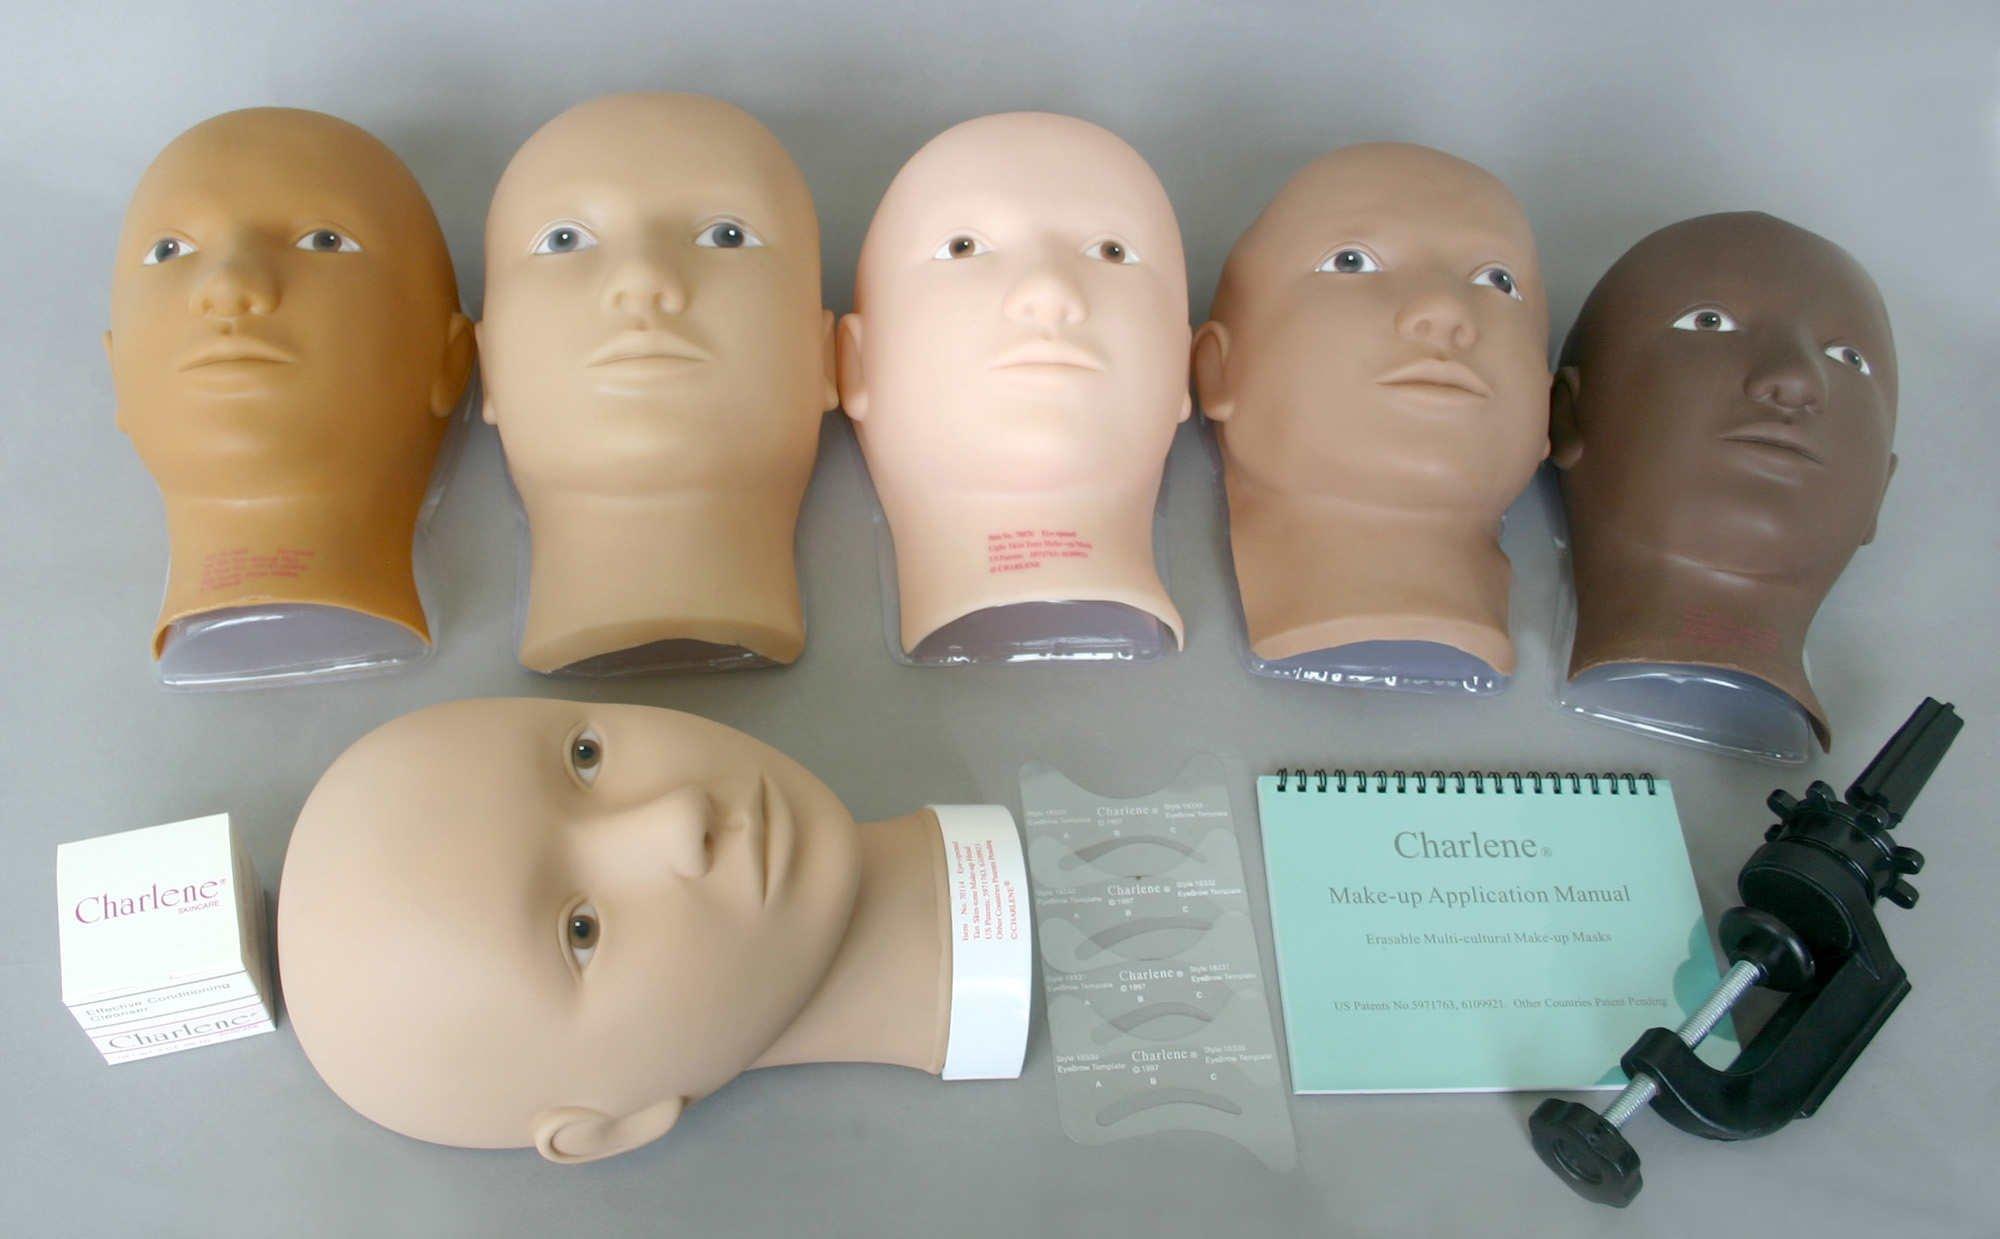 Charlene Erasable Make-up Mannequin Mask Kit - Tan/Dark Skin Tone, Open Eyes